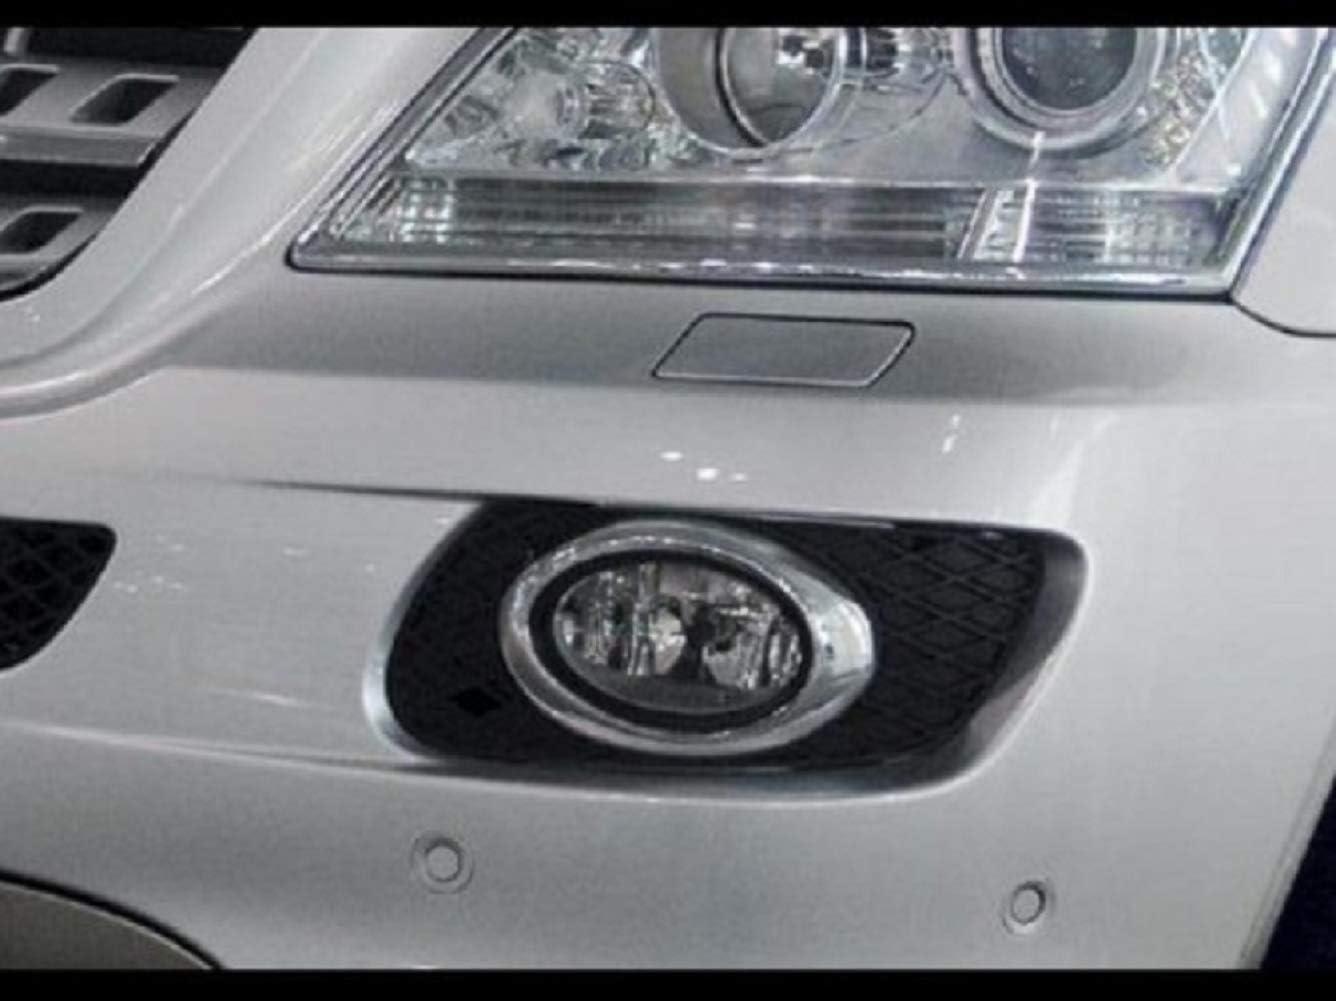 Oval Type for Mercedes Benz W164 ML Class 05-08 Haneex Chrome Front Fog Light Cover Trim Fog Light Cover Frame Set